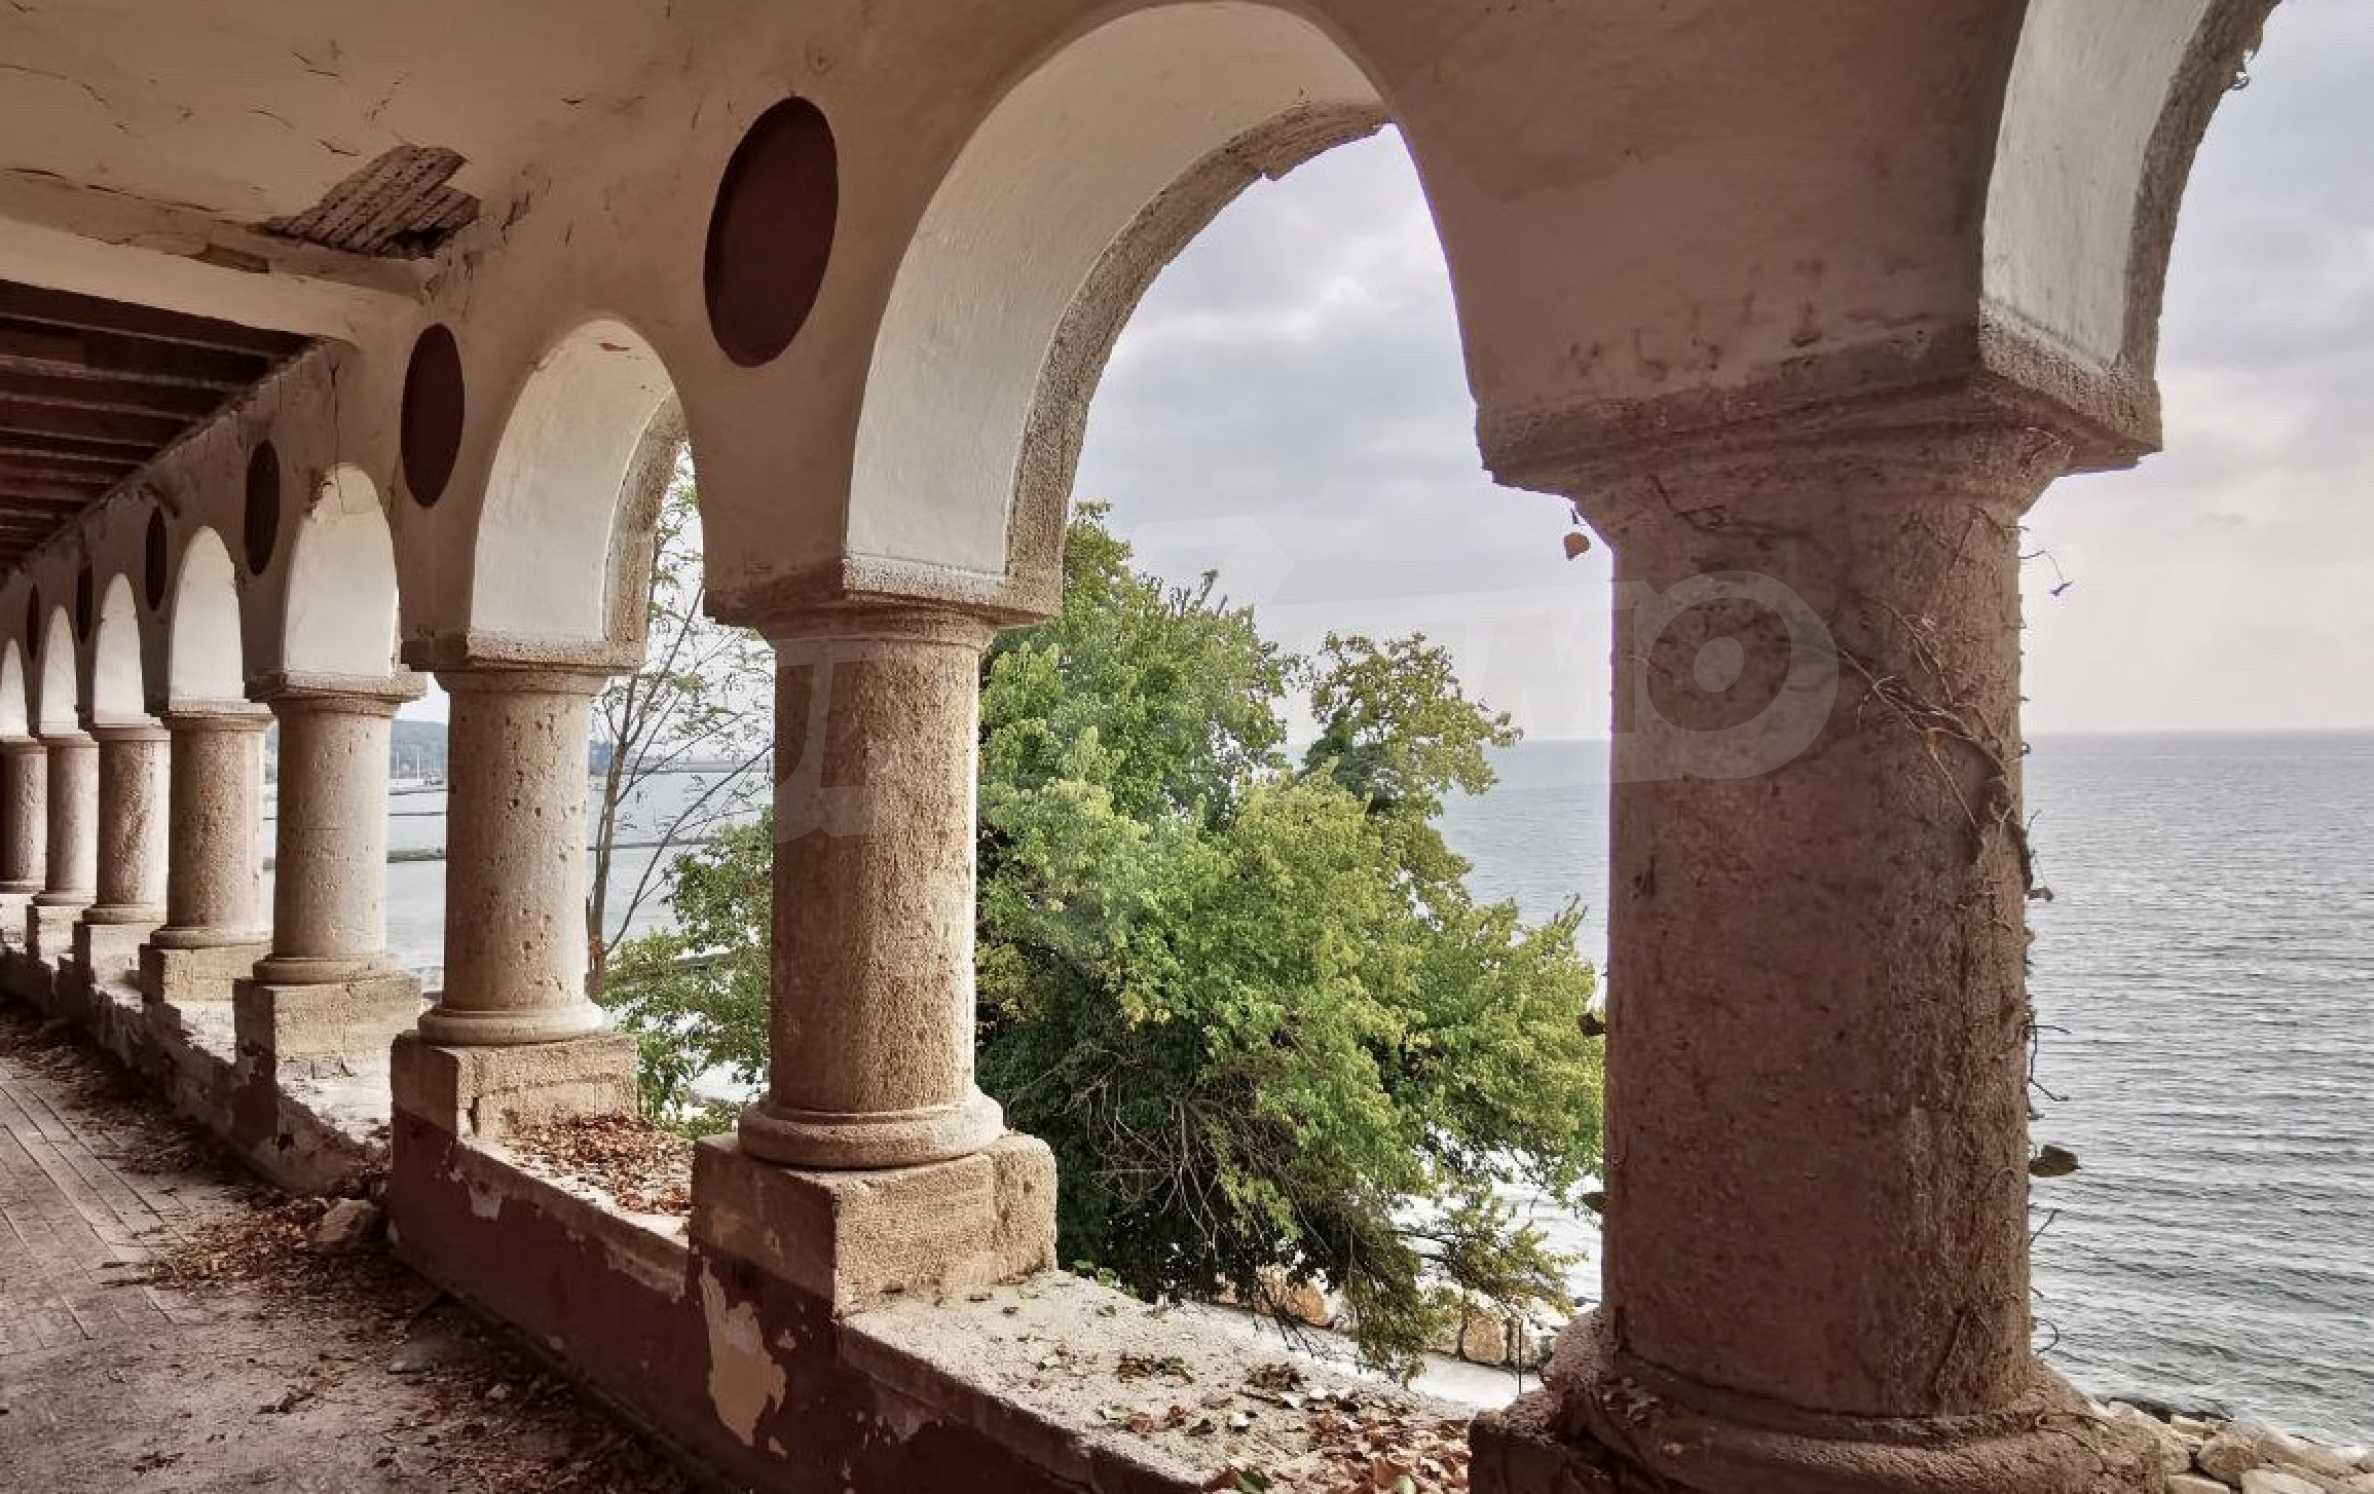 Villa Storck - an aristocratic mansion on the beach 5